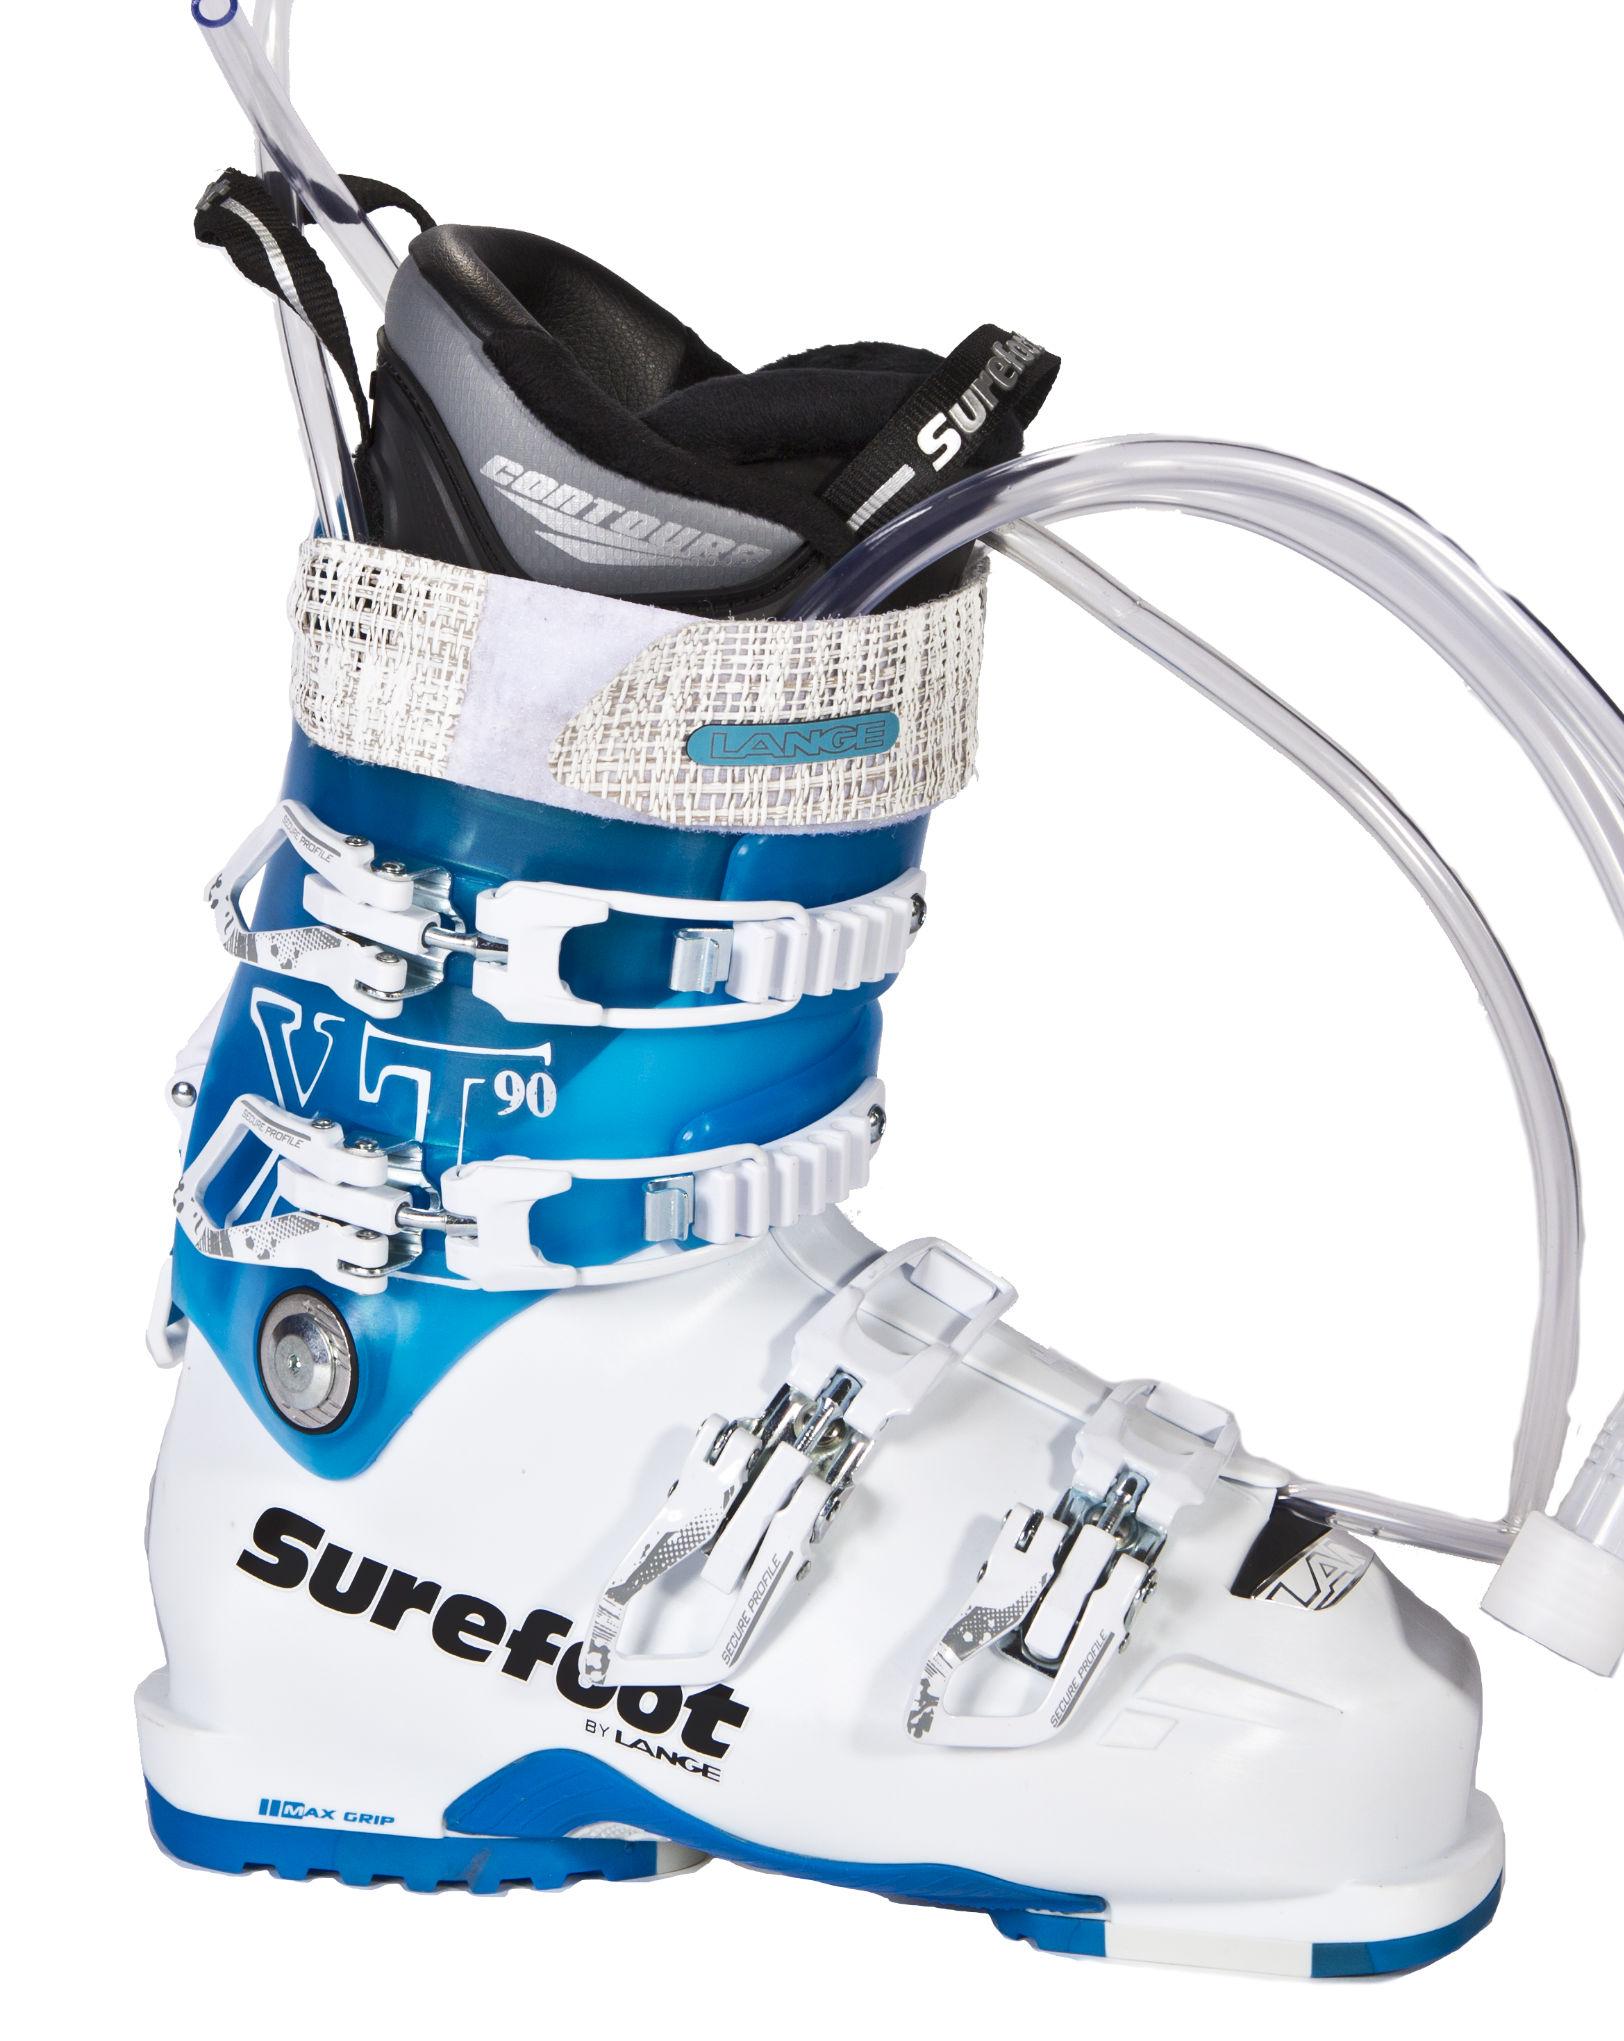 Ski Boots Custom Ski Boots Comfortable Ski Boots